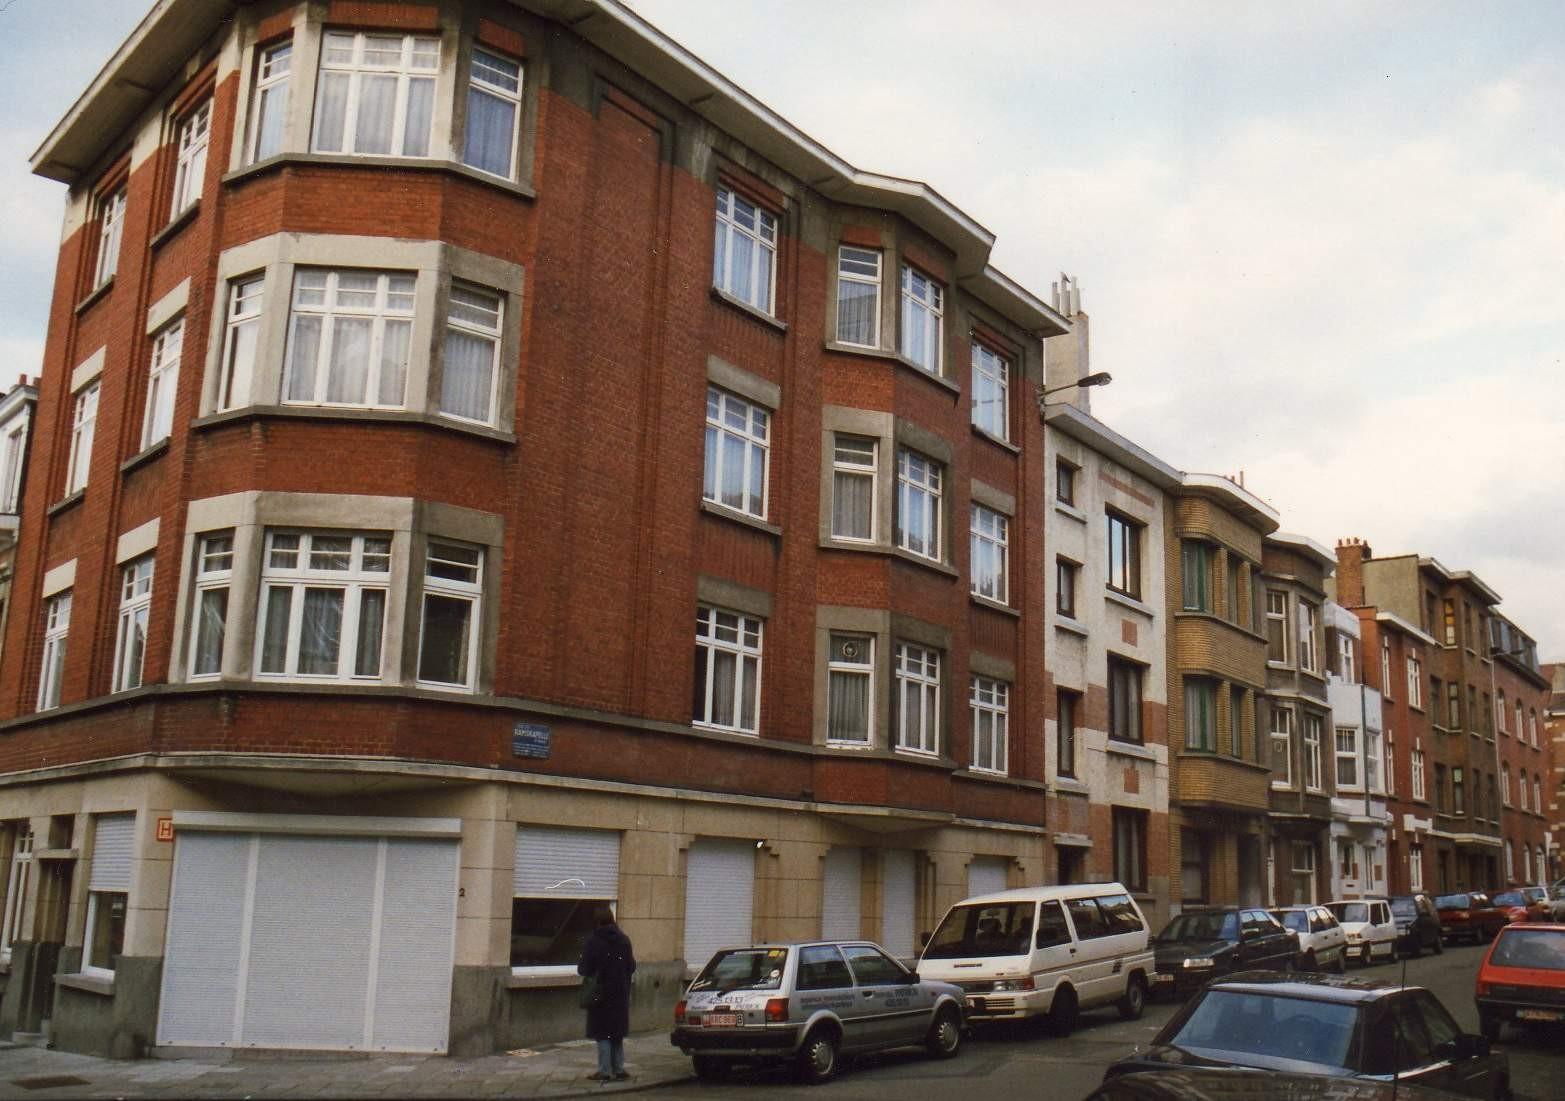 Rue de Ramskapelle, enfilade côté pair depuis la rue Tervaete., 1994